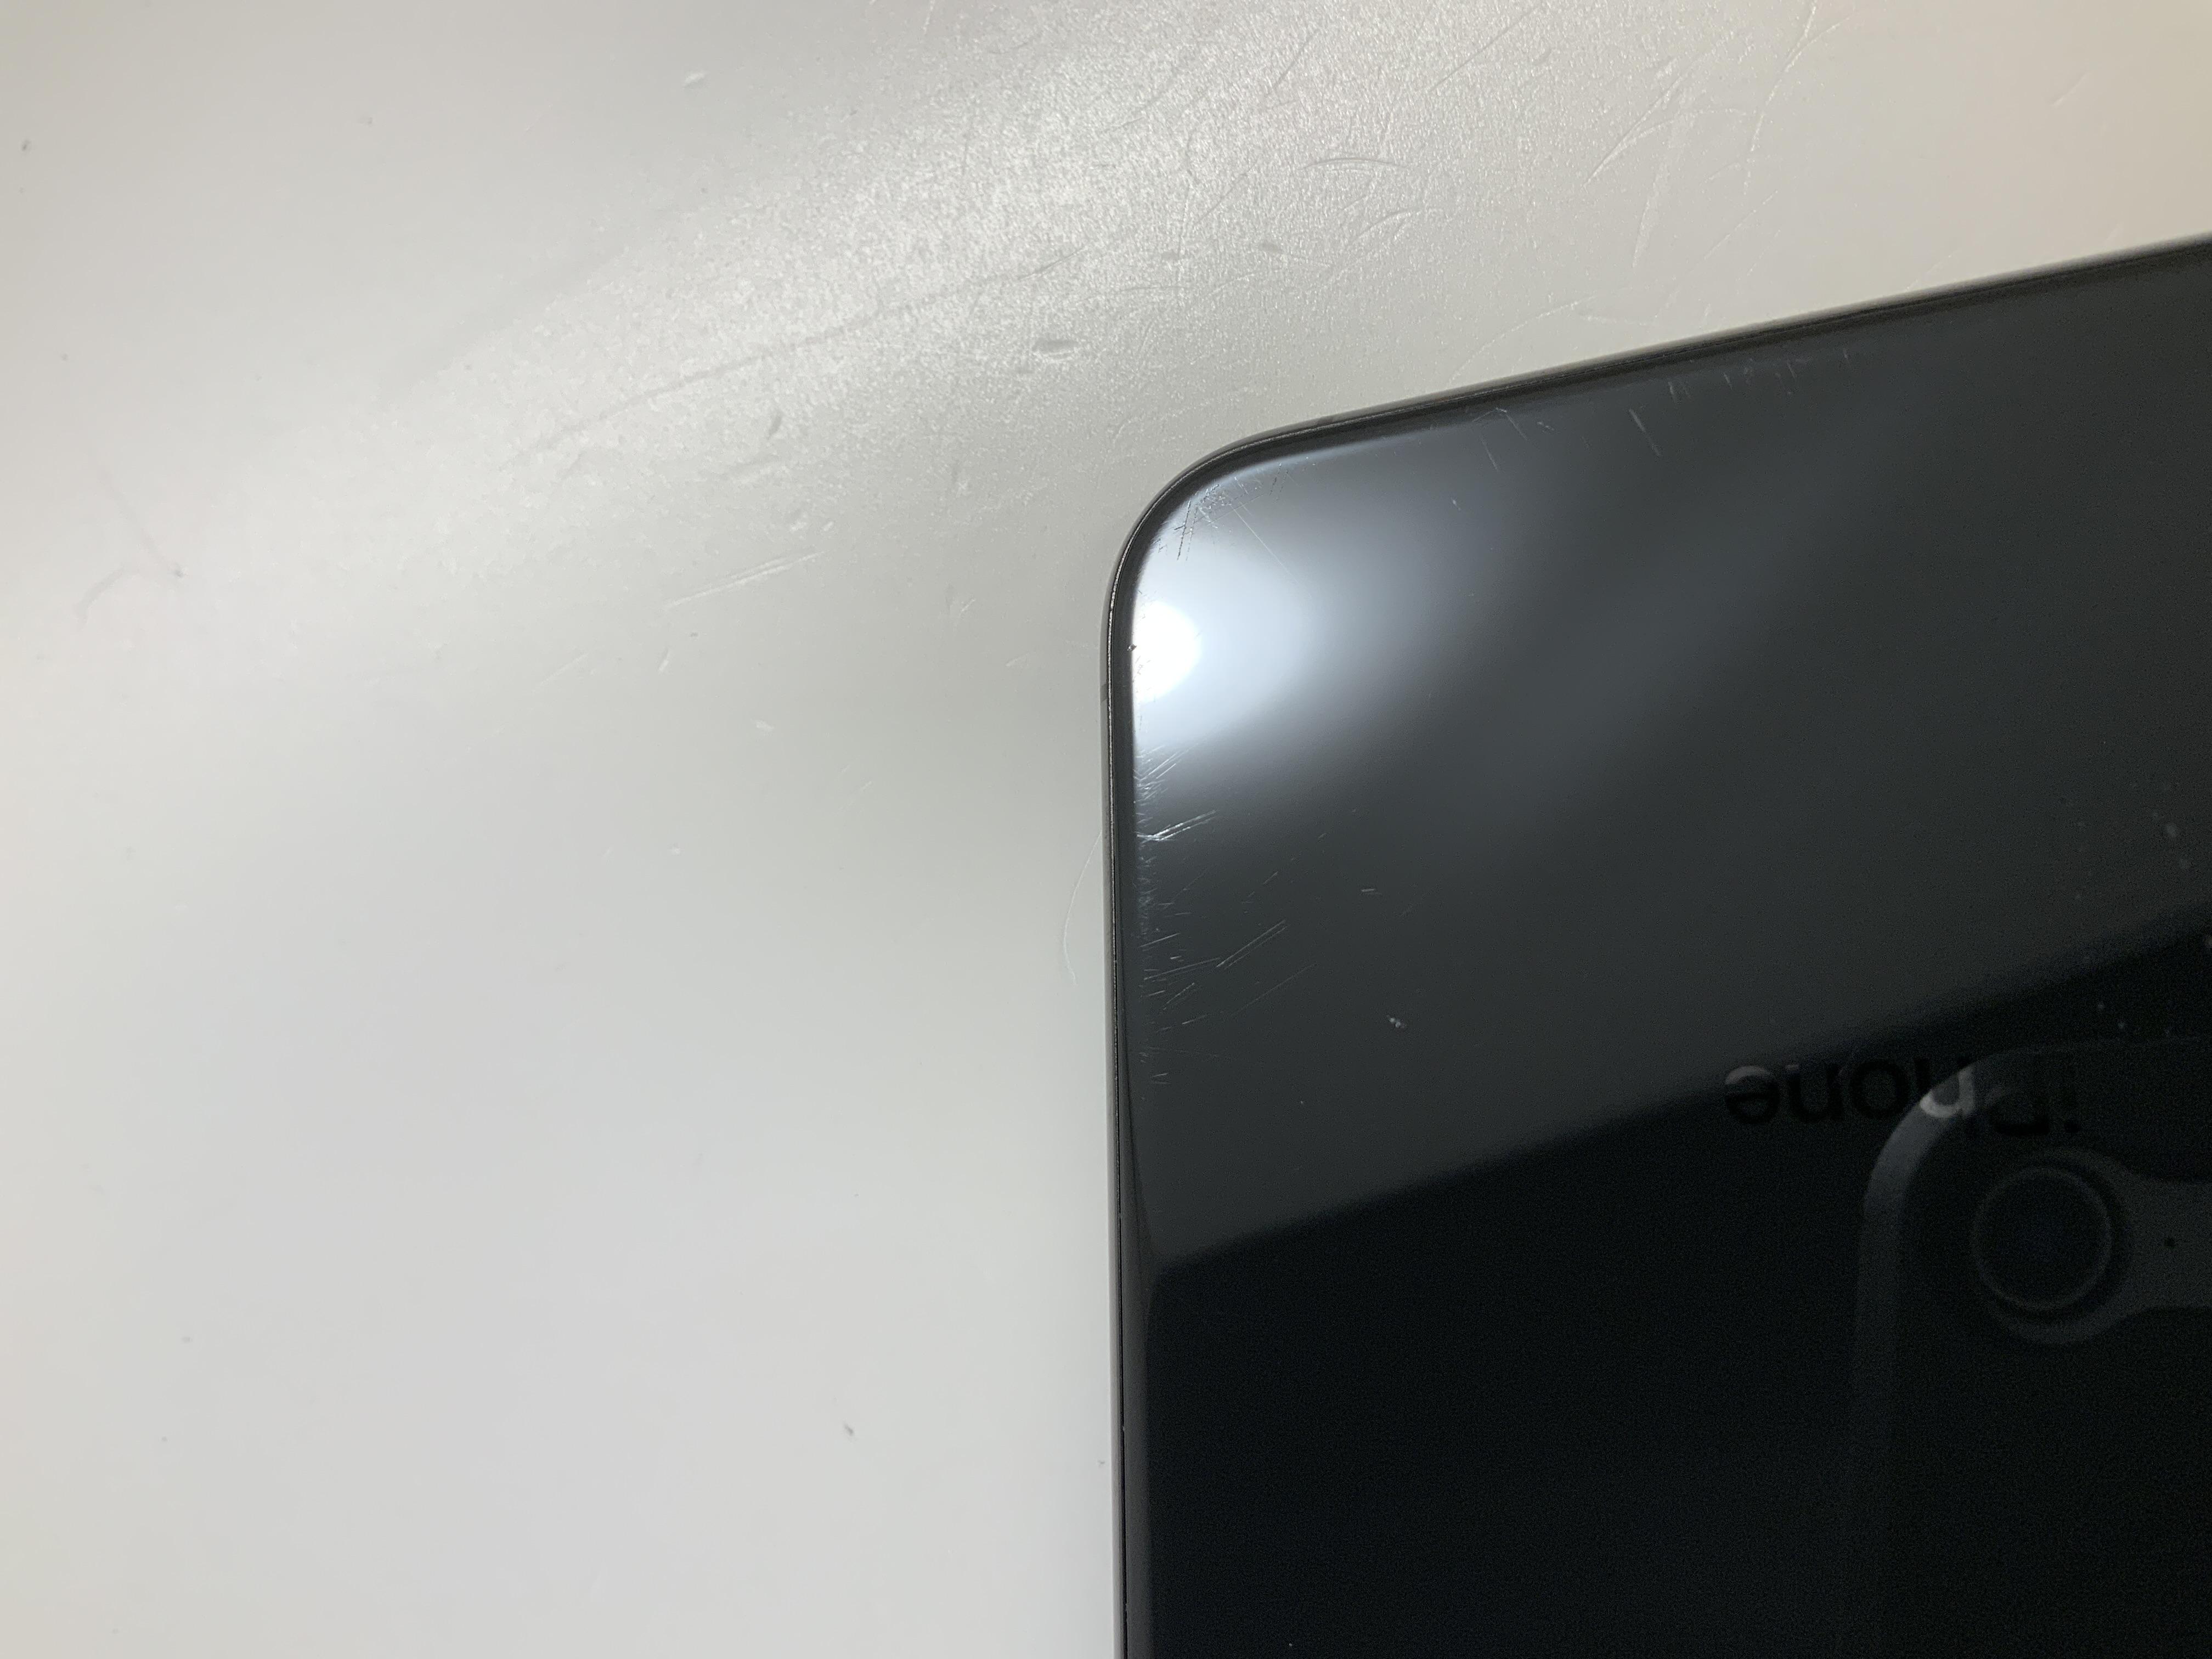 iPhone XS Max 256GB, 256GB, Space Gray, image 4